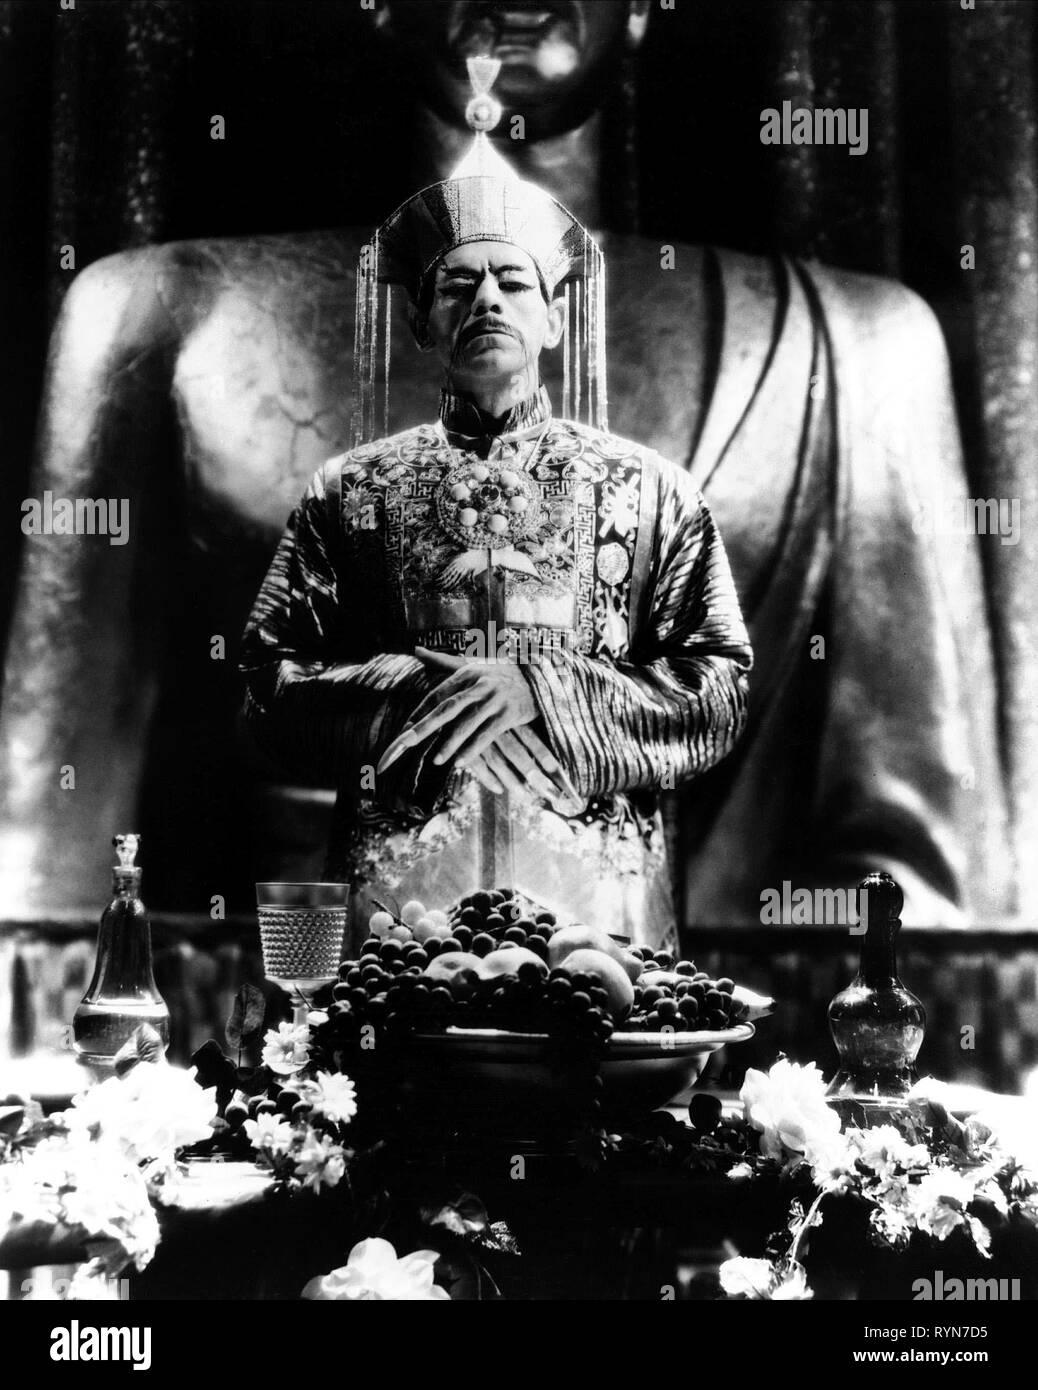 Manchu Black and White Stock Photos & Images - Alamy